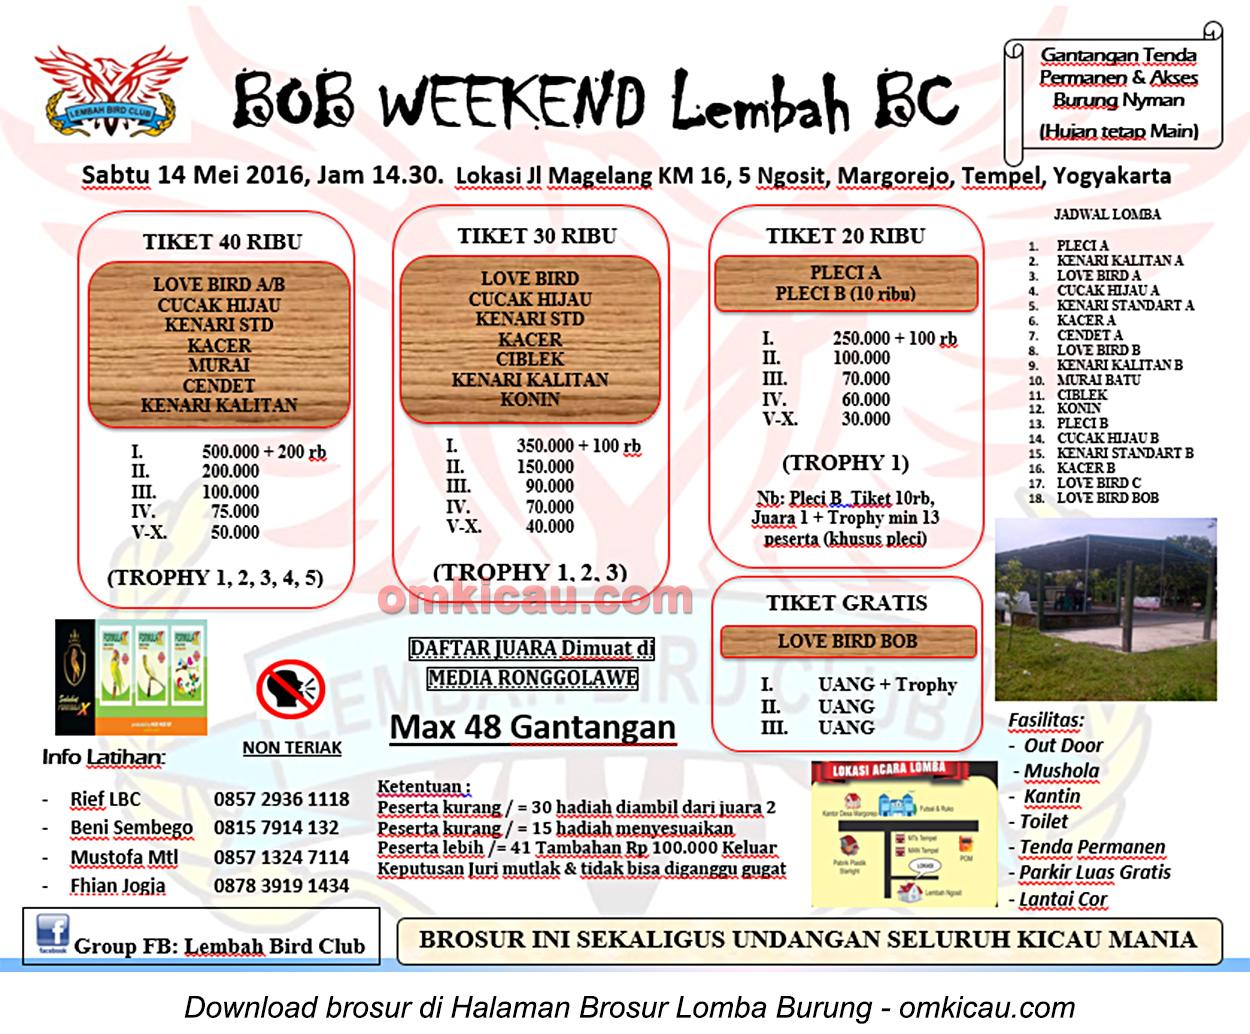 Brosur Latber BOB Weekend Lembah BC, Sleman, 14 Mei 2016